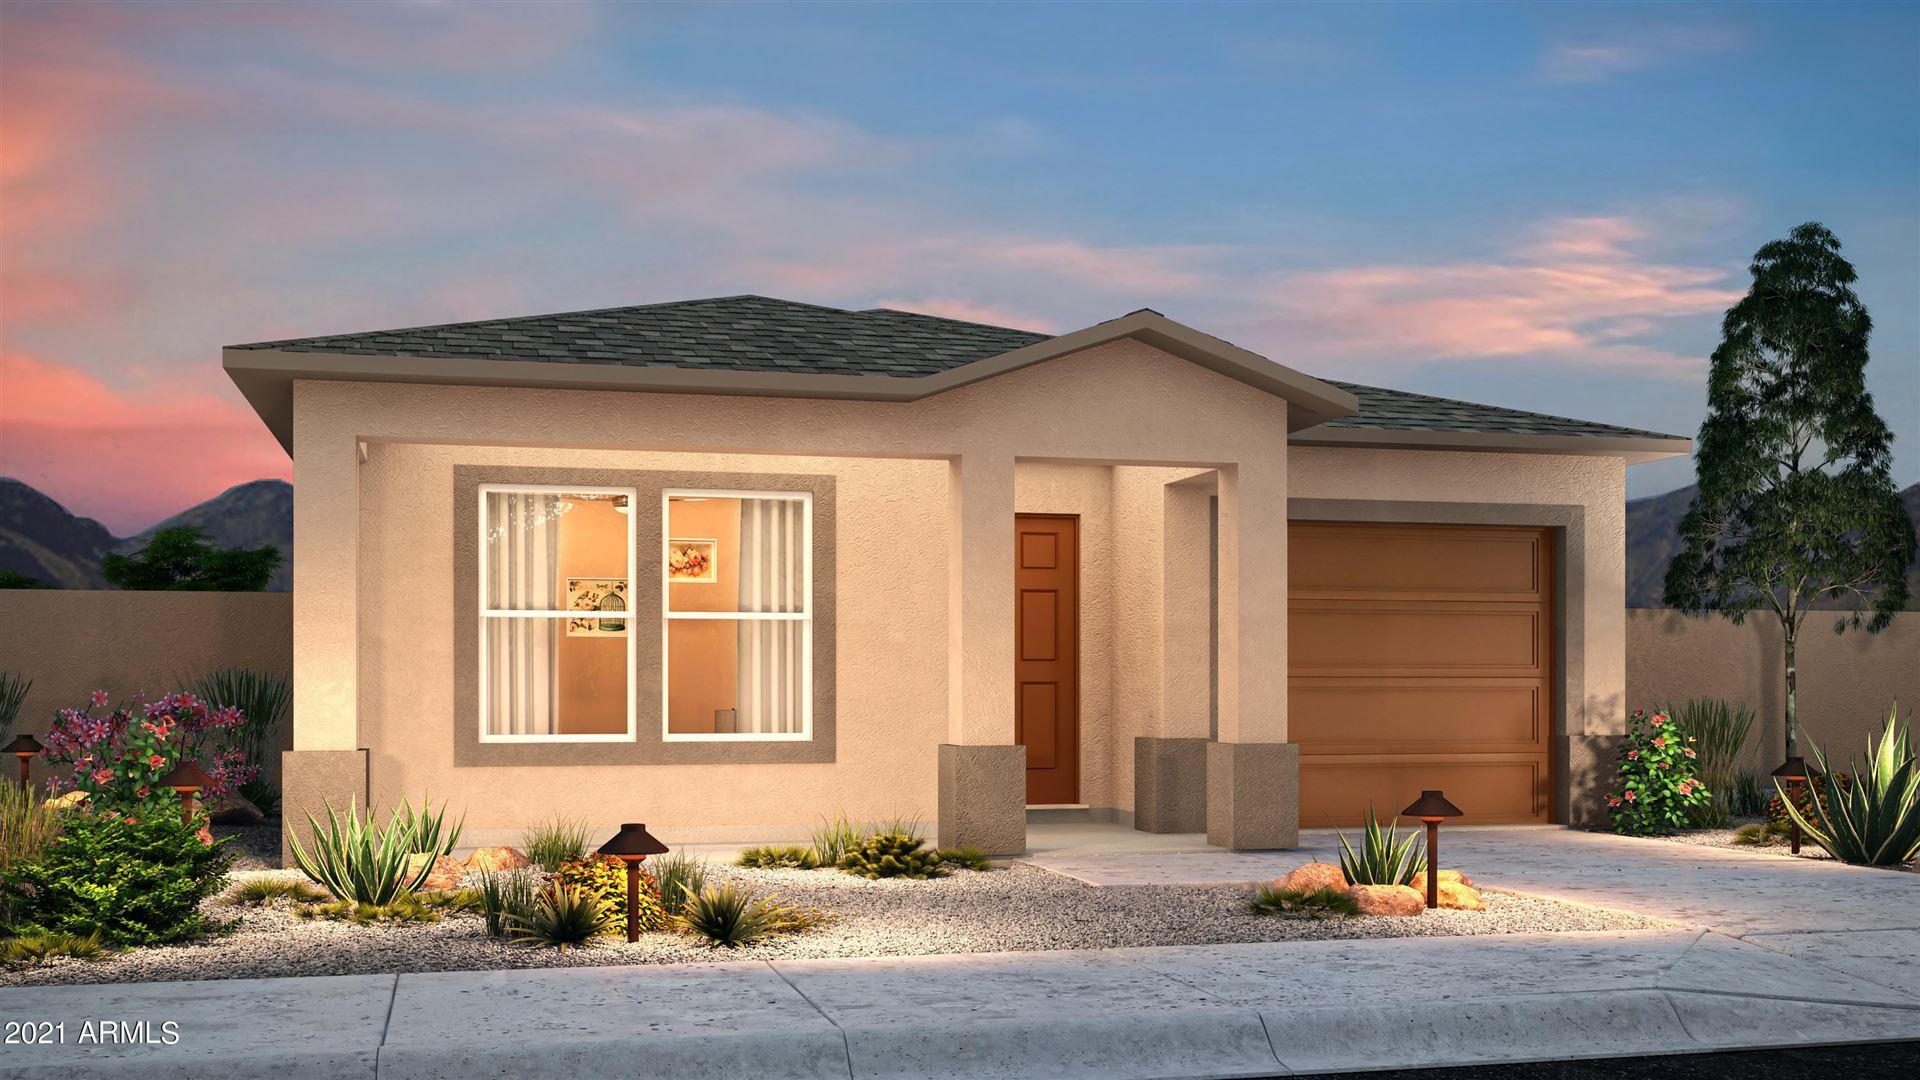 Photo of 167 ARKIN Circle, Morristown, AZ 85342 (MLS # 6259284)